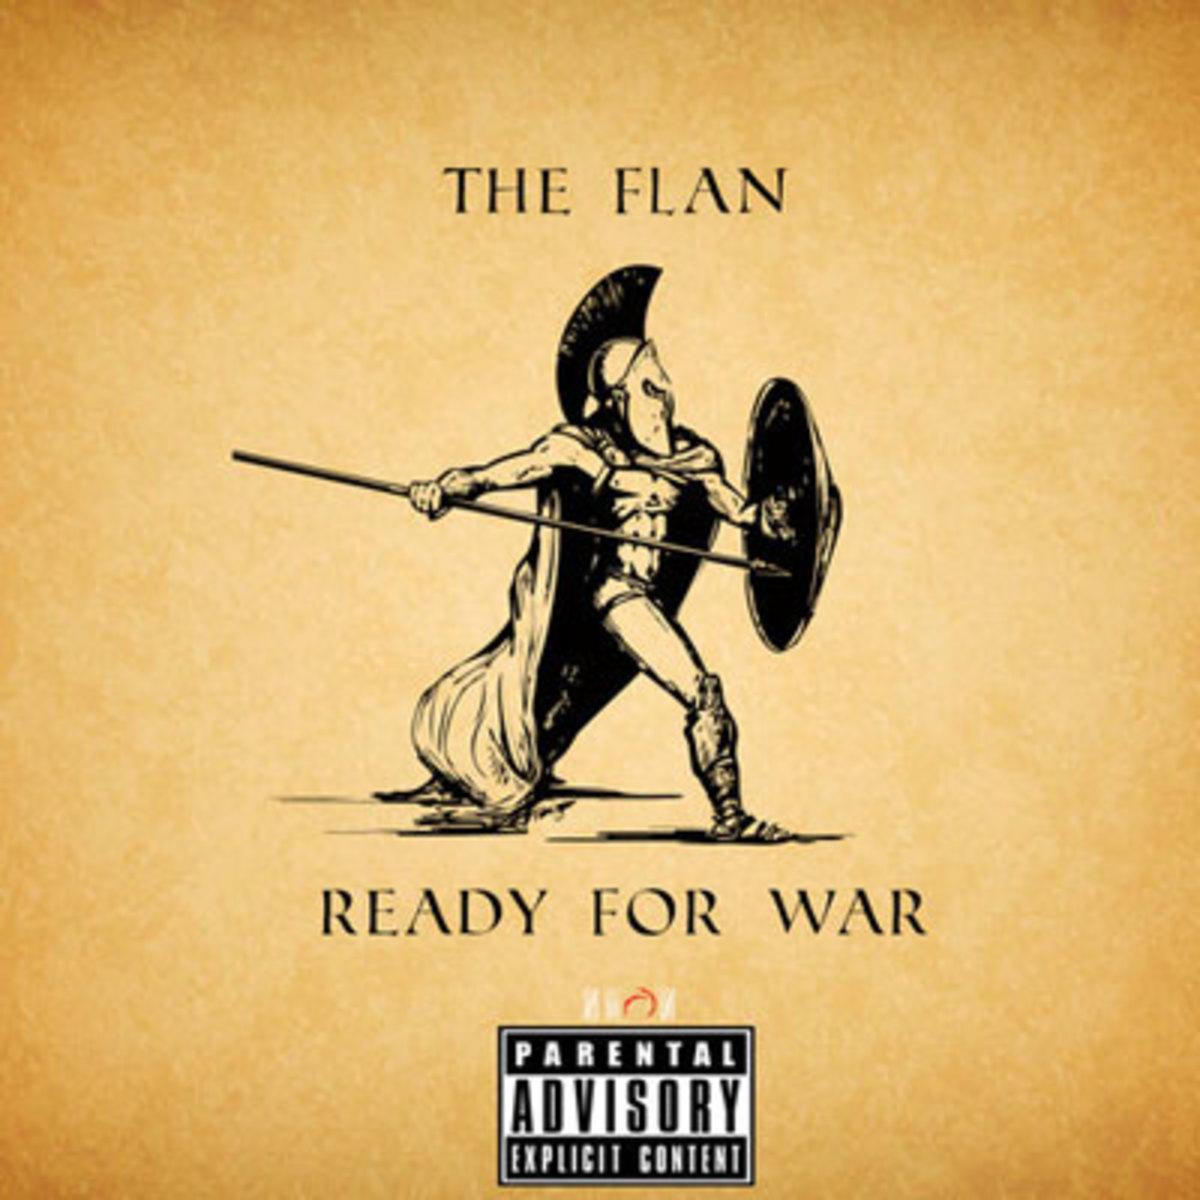 theflan-readyforwar.jpg